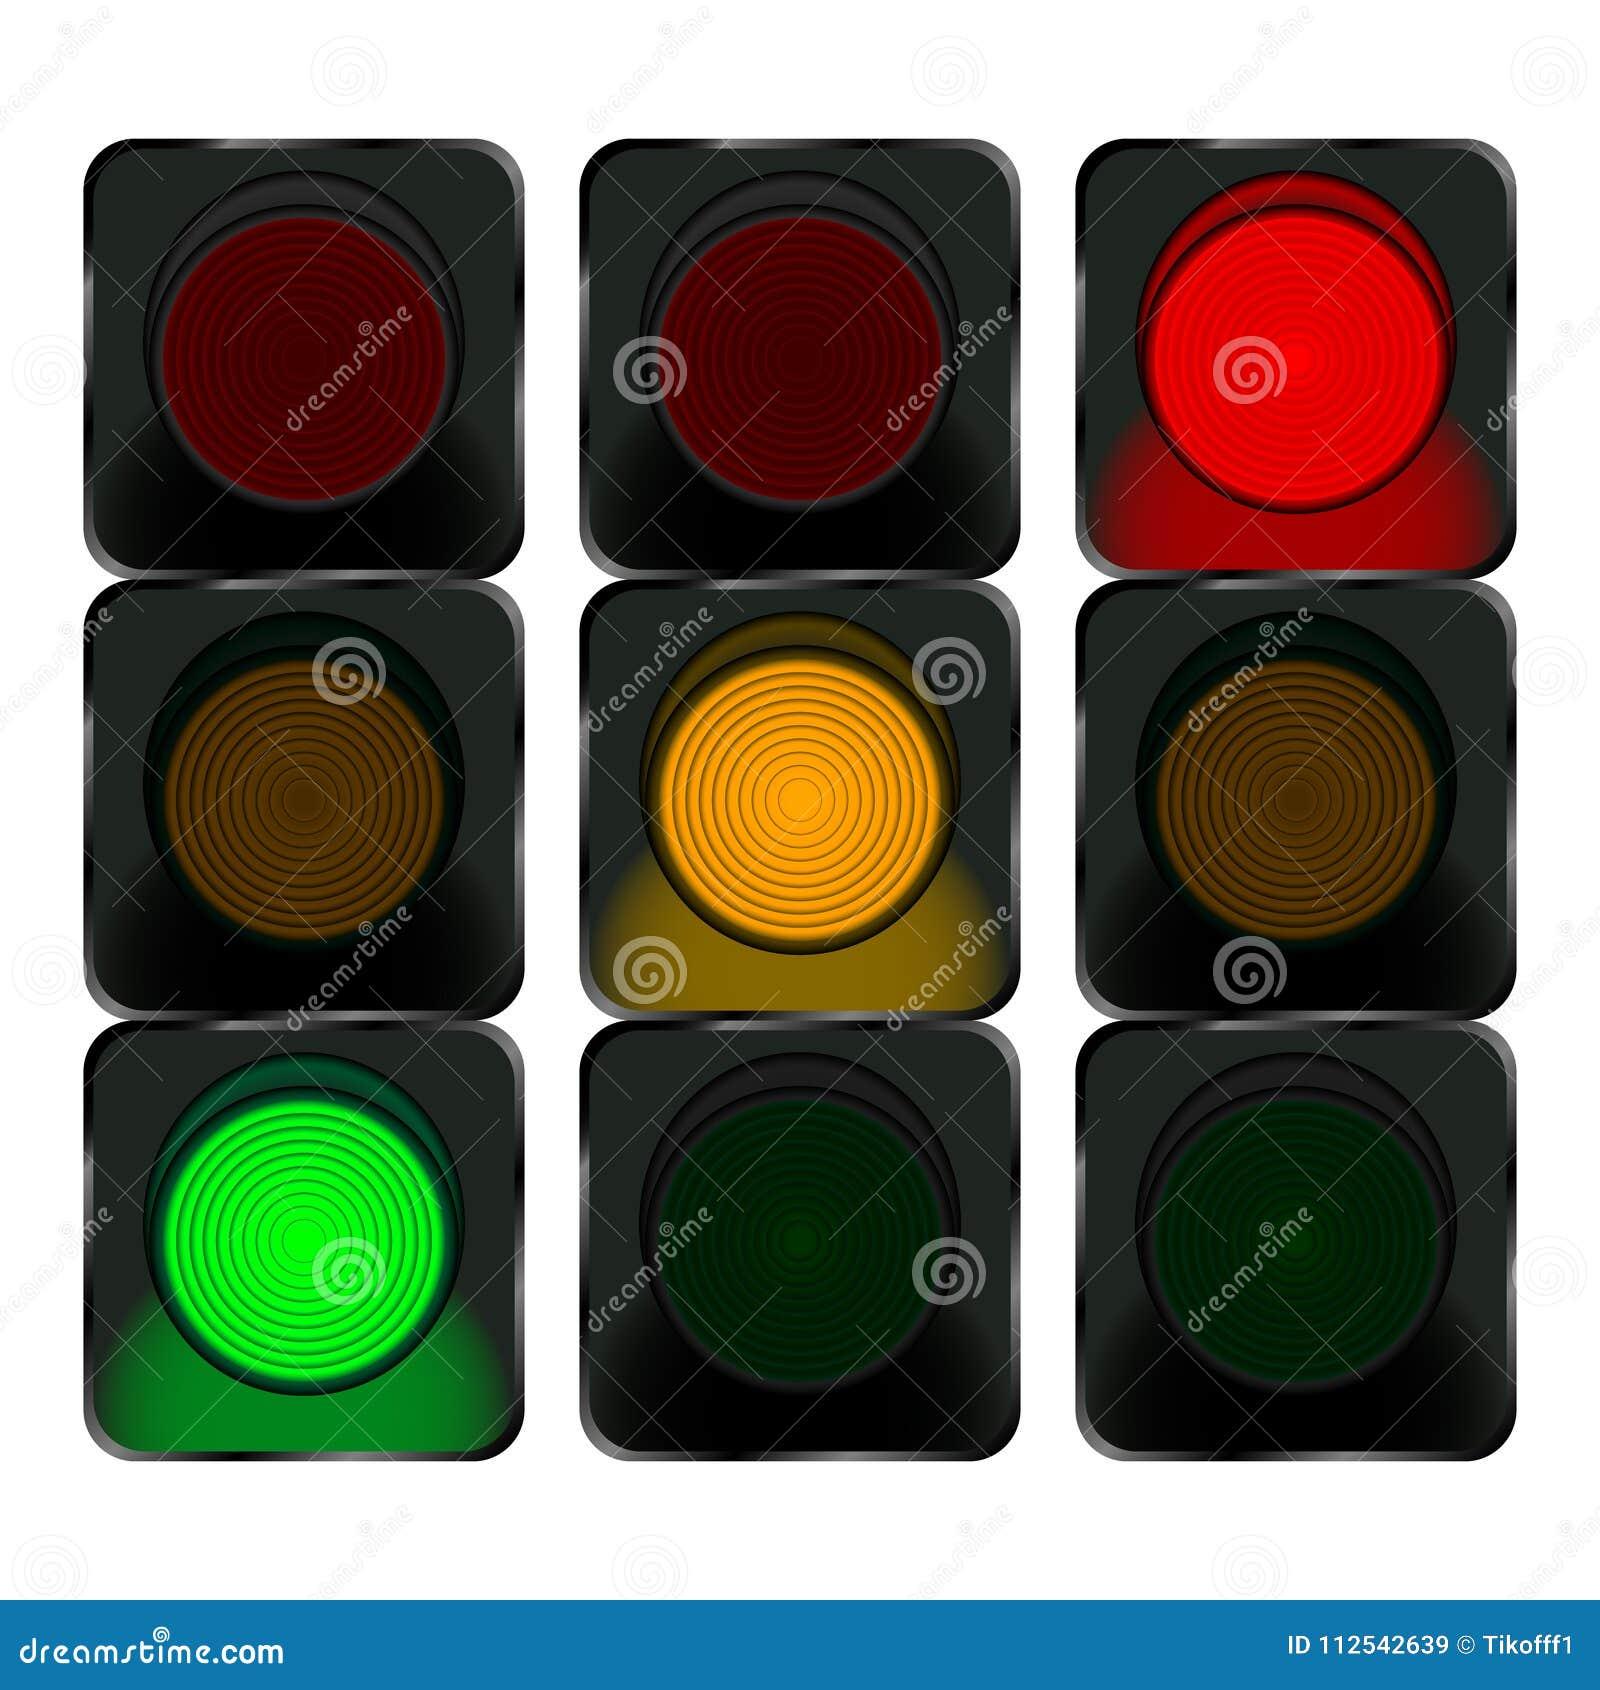 feux de signalisation lumi re rouge lumi re orange feu vert illustration de vecteur. Black Bedroom Furniture Sets. Home Design Ideas